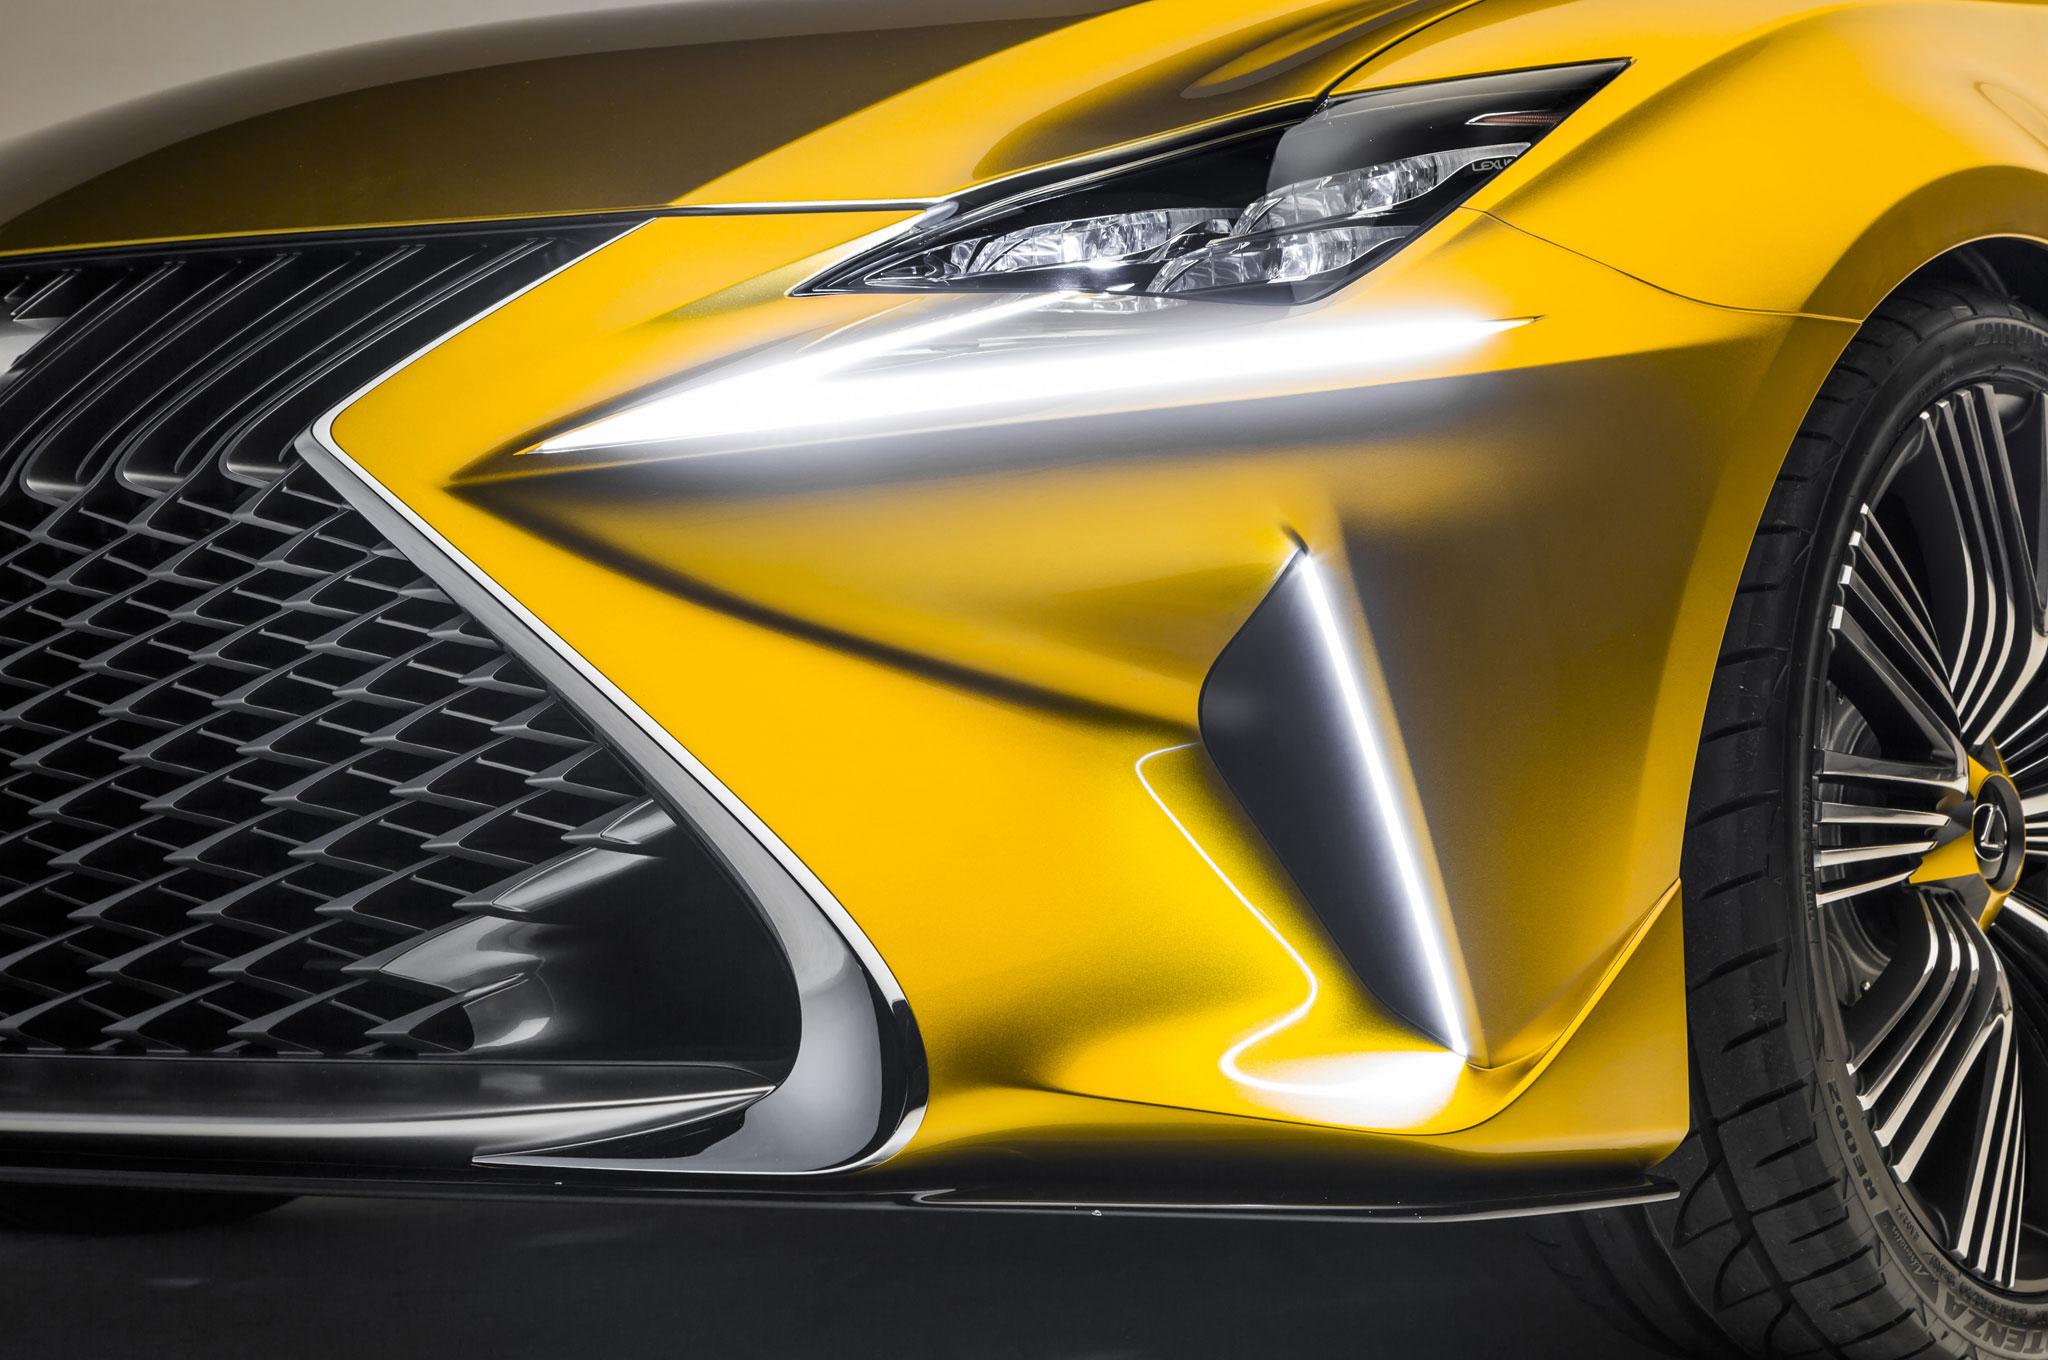 http://st.automobilemag.com/uploads/sites/11/2014/11/Lexus-LF-C2-concept-lights.jpg